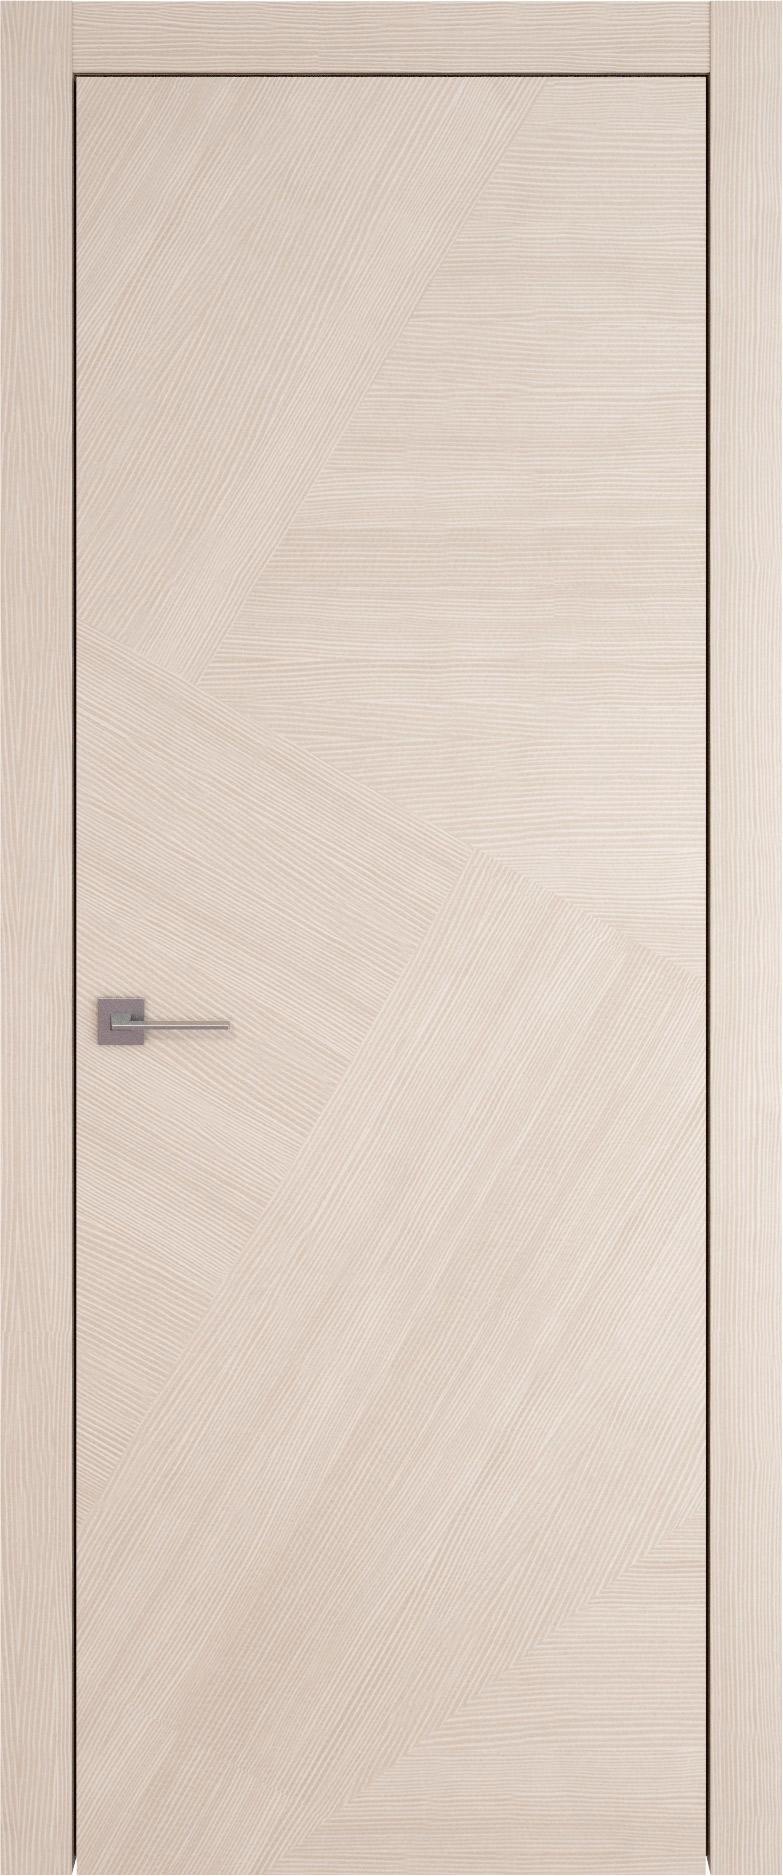 Tivoli М-1 цвет - Беленый дуб Без стекла (ДГ)